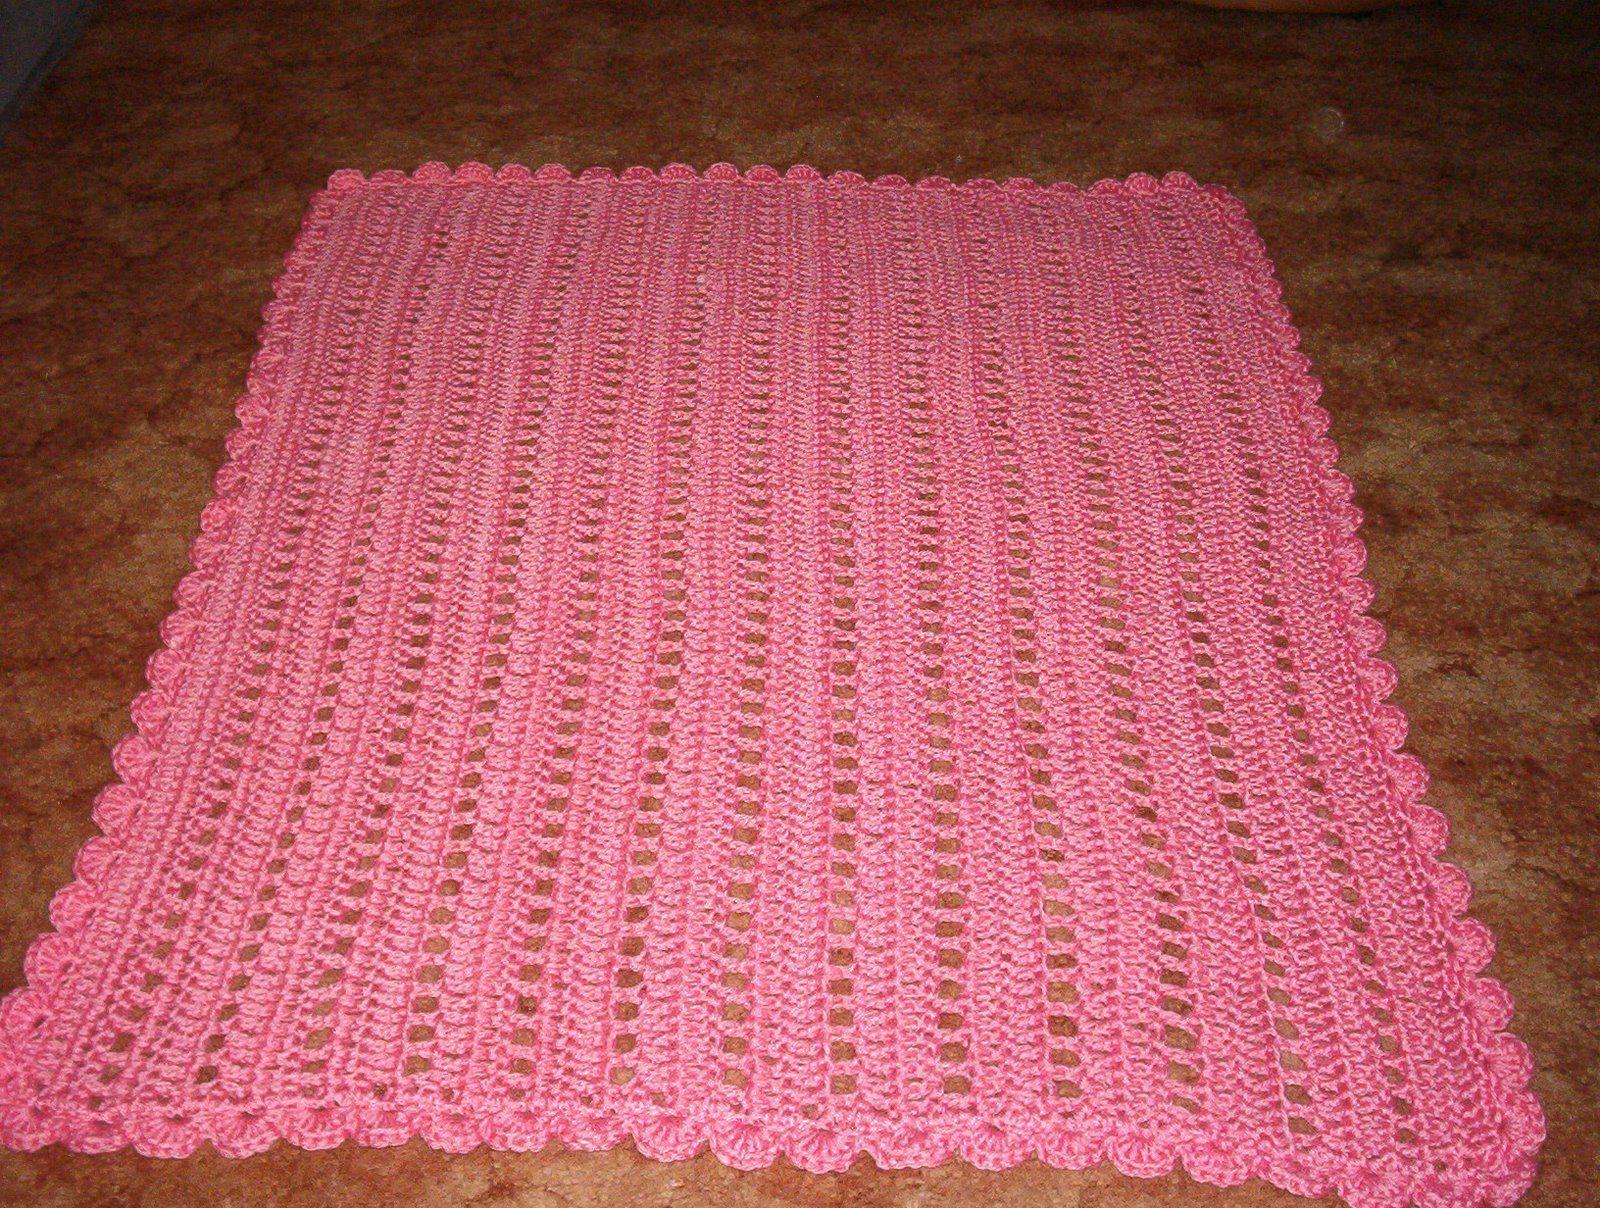 Pin de Donnawest en Crochet | Pinterest